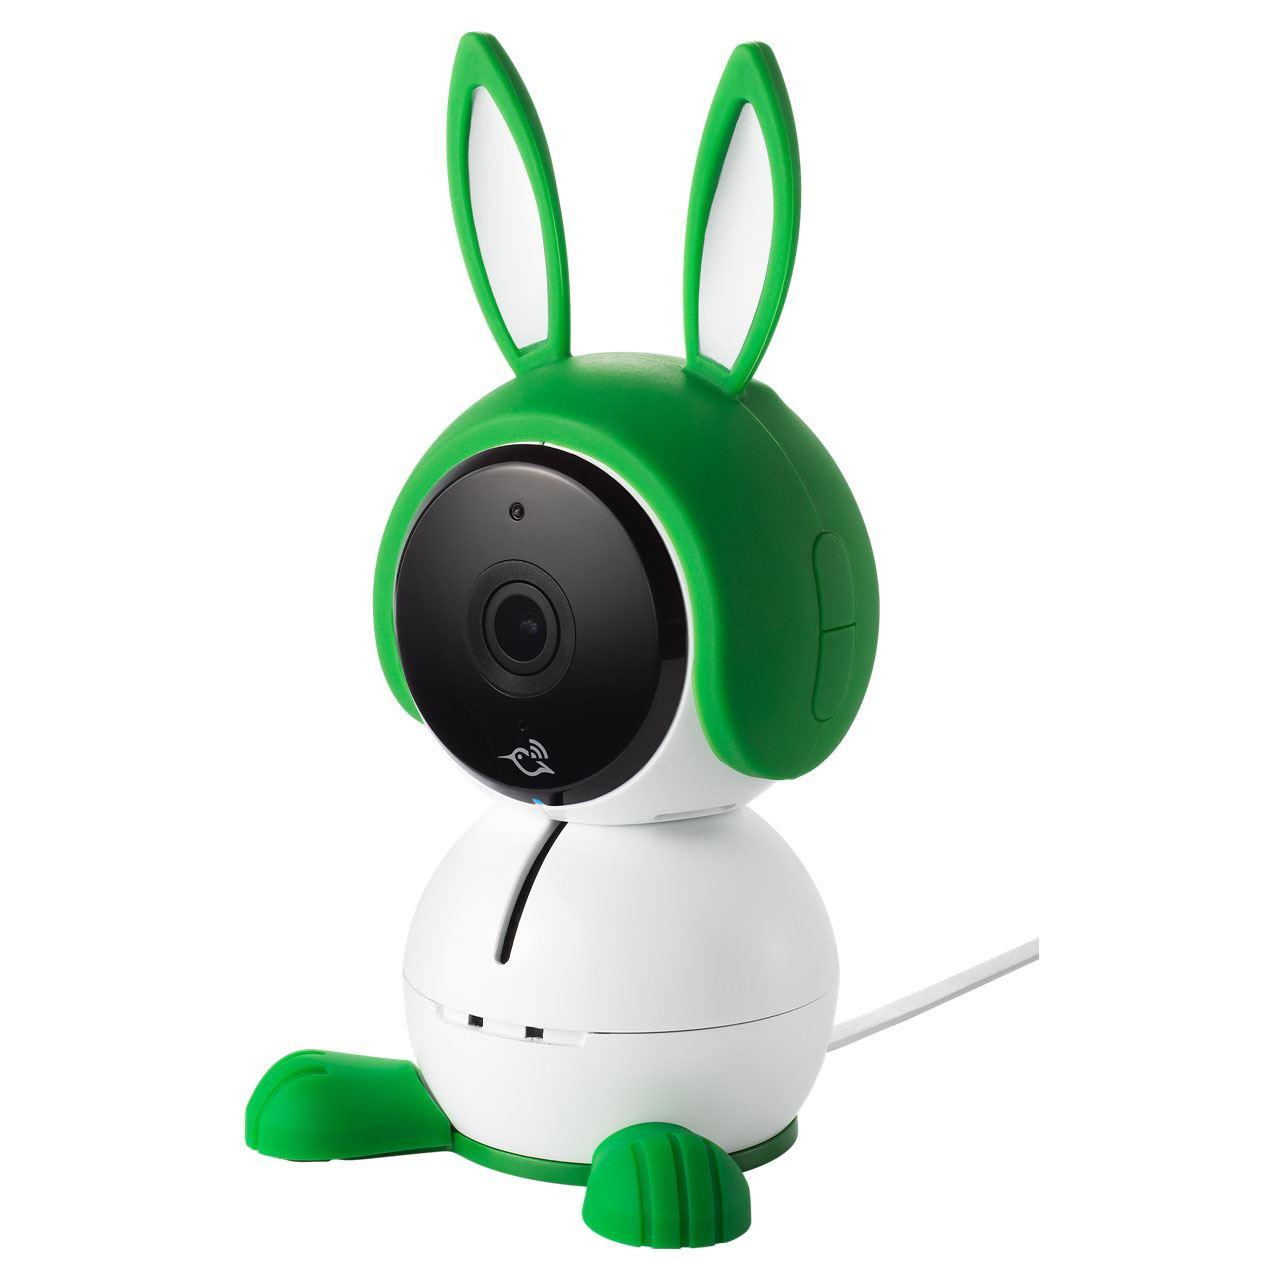 netgear arlo baby hd kamera 1080p ip kameras lan hardware notebooks software. Black Bedroom Furniture Sets. Home Design Ideas